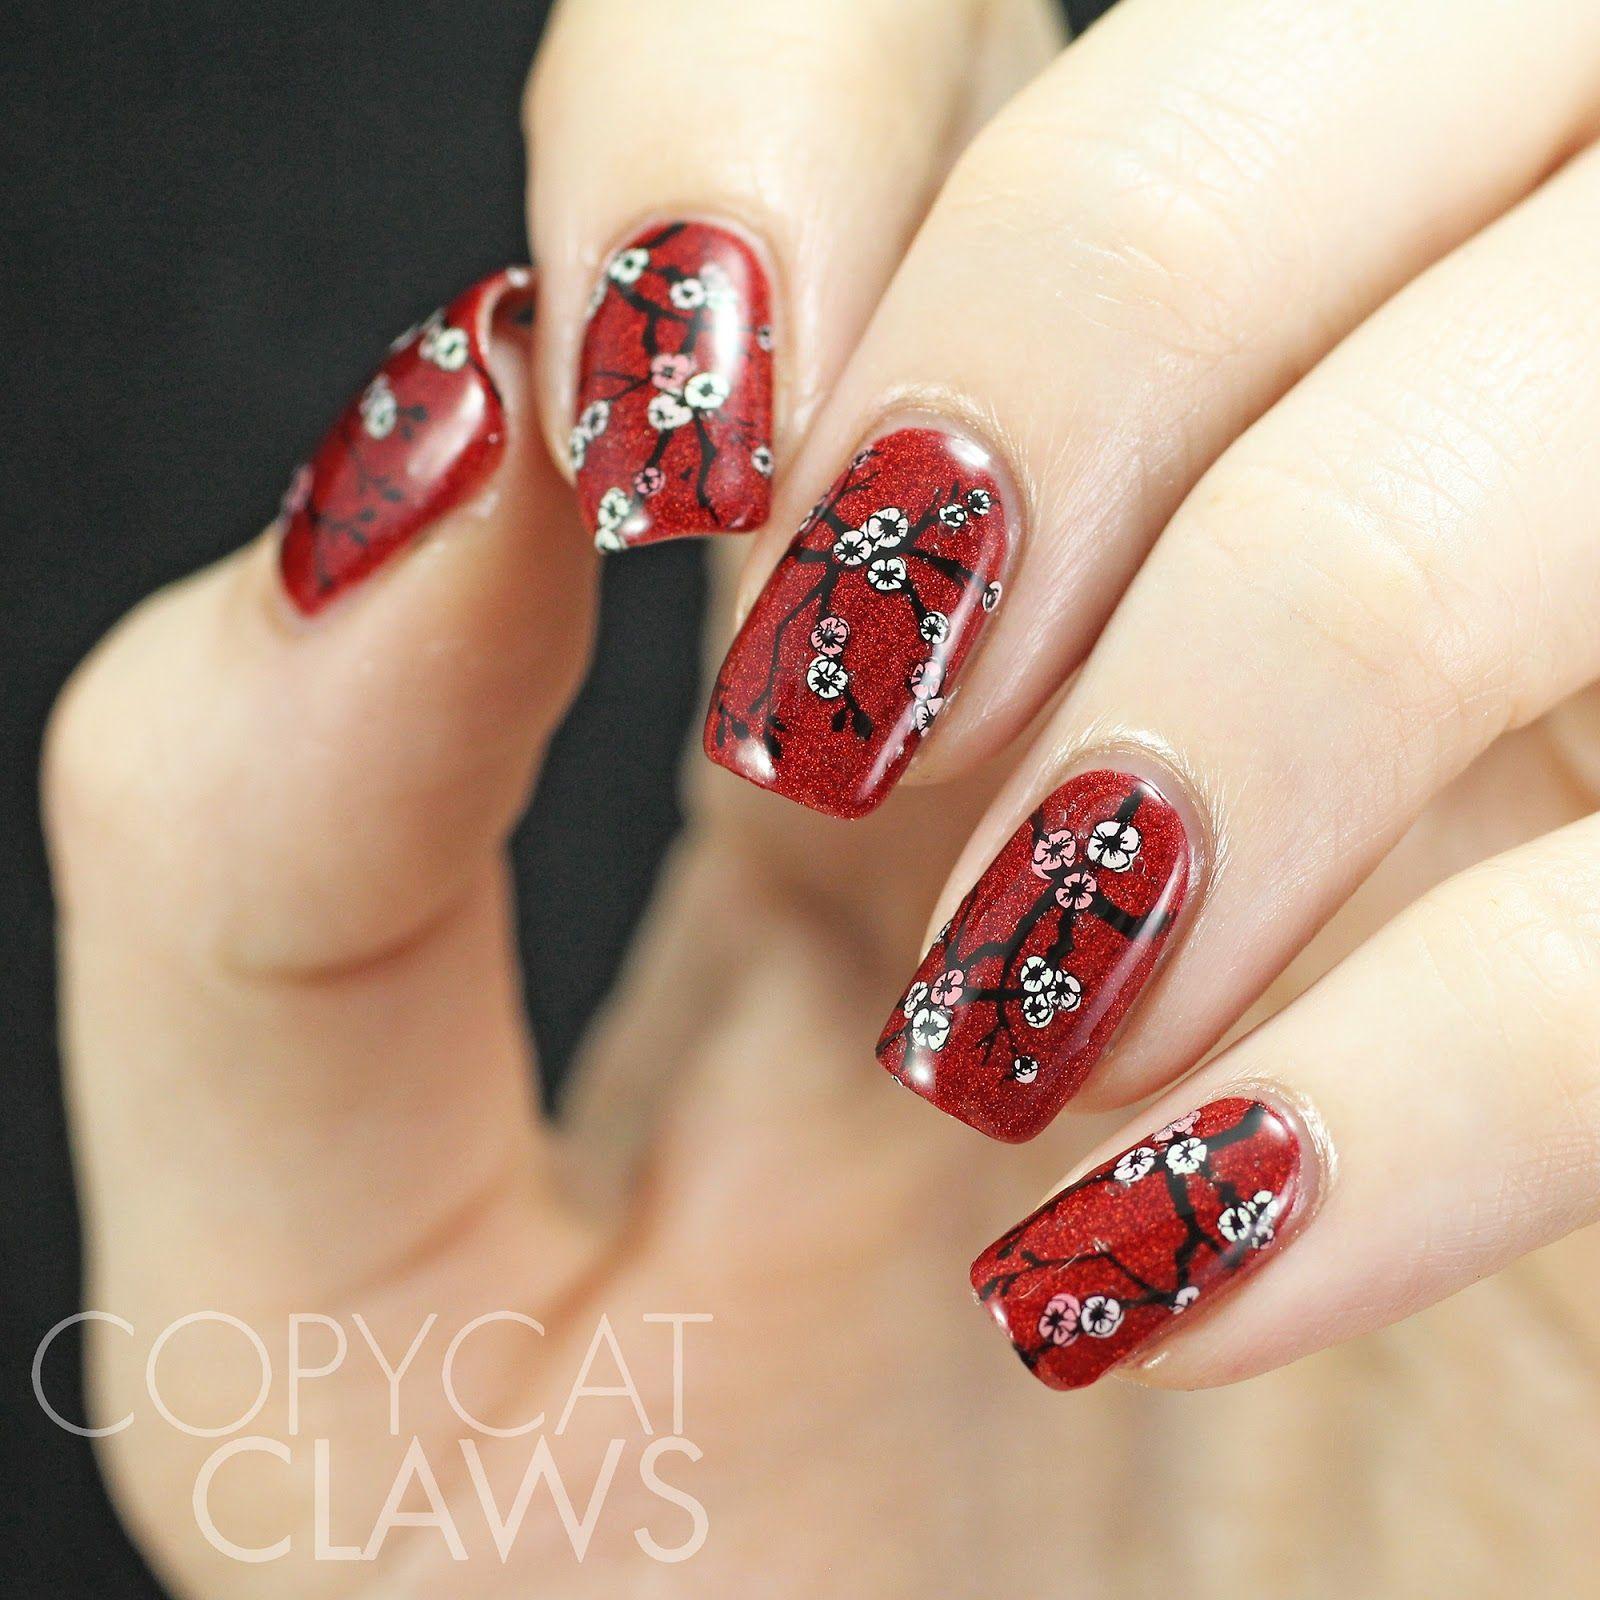 Sunday Stamping - Chinese New Year Nails | My life nails | Pinterest ...